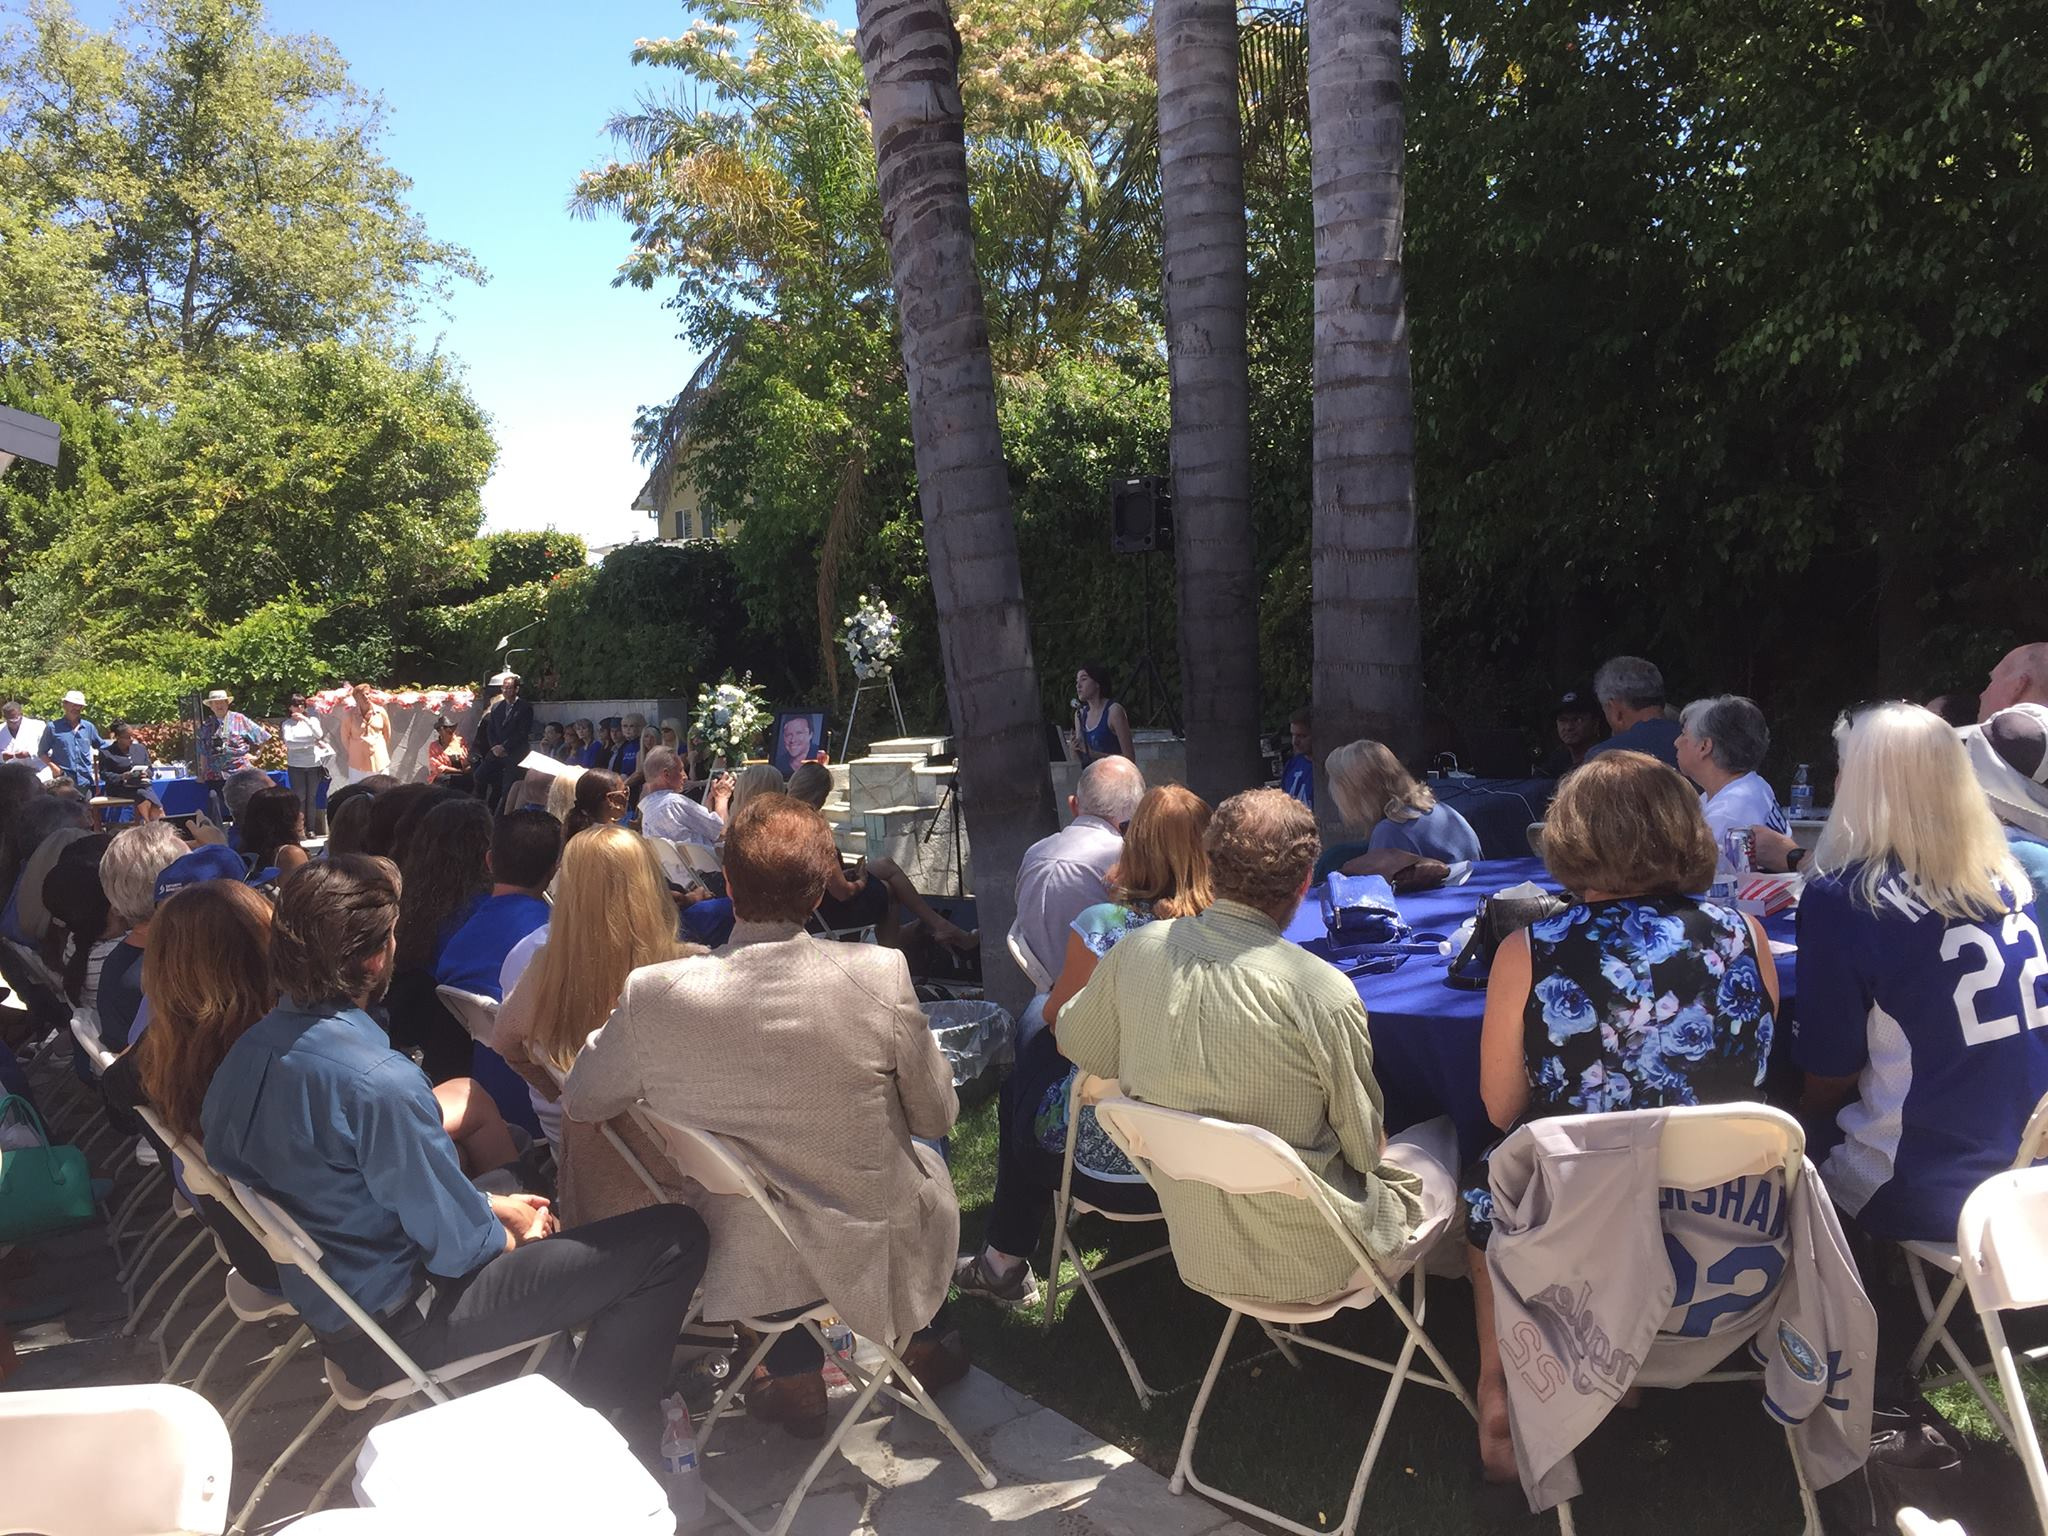 Celebration of Life Memorial for Steve Nave